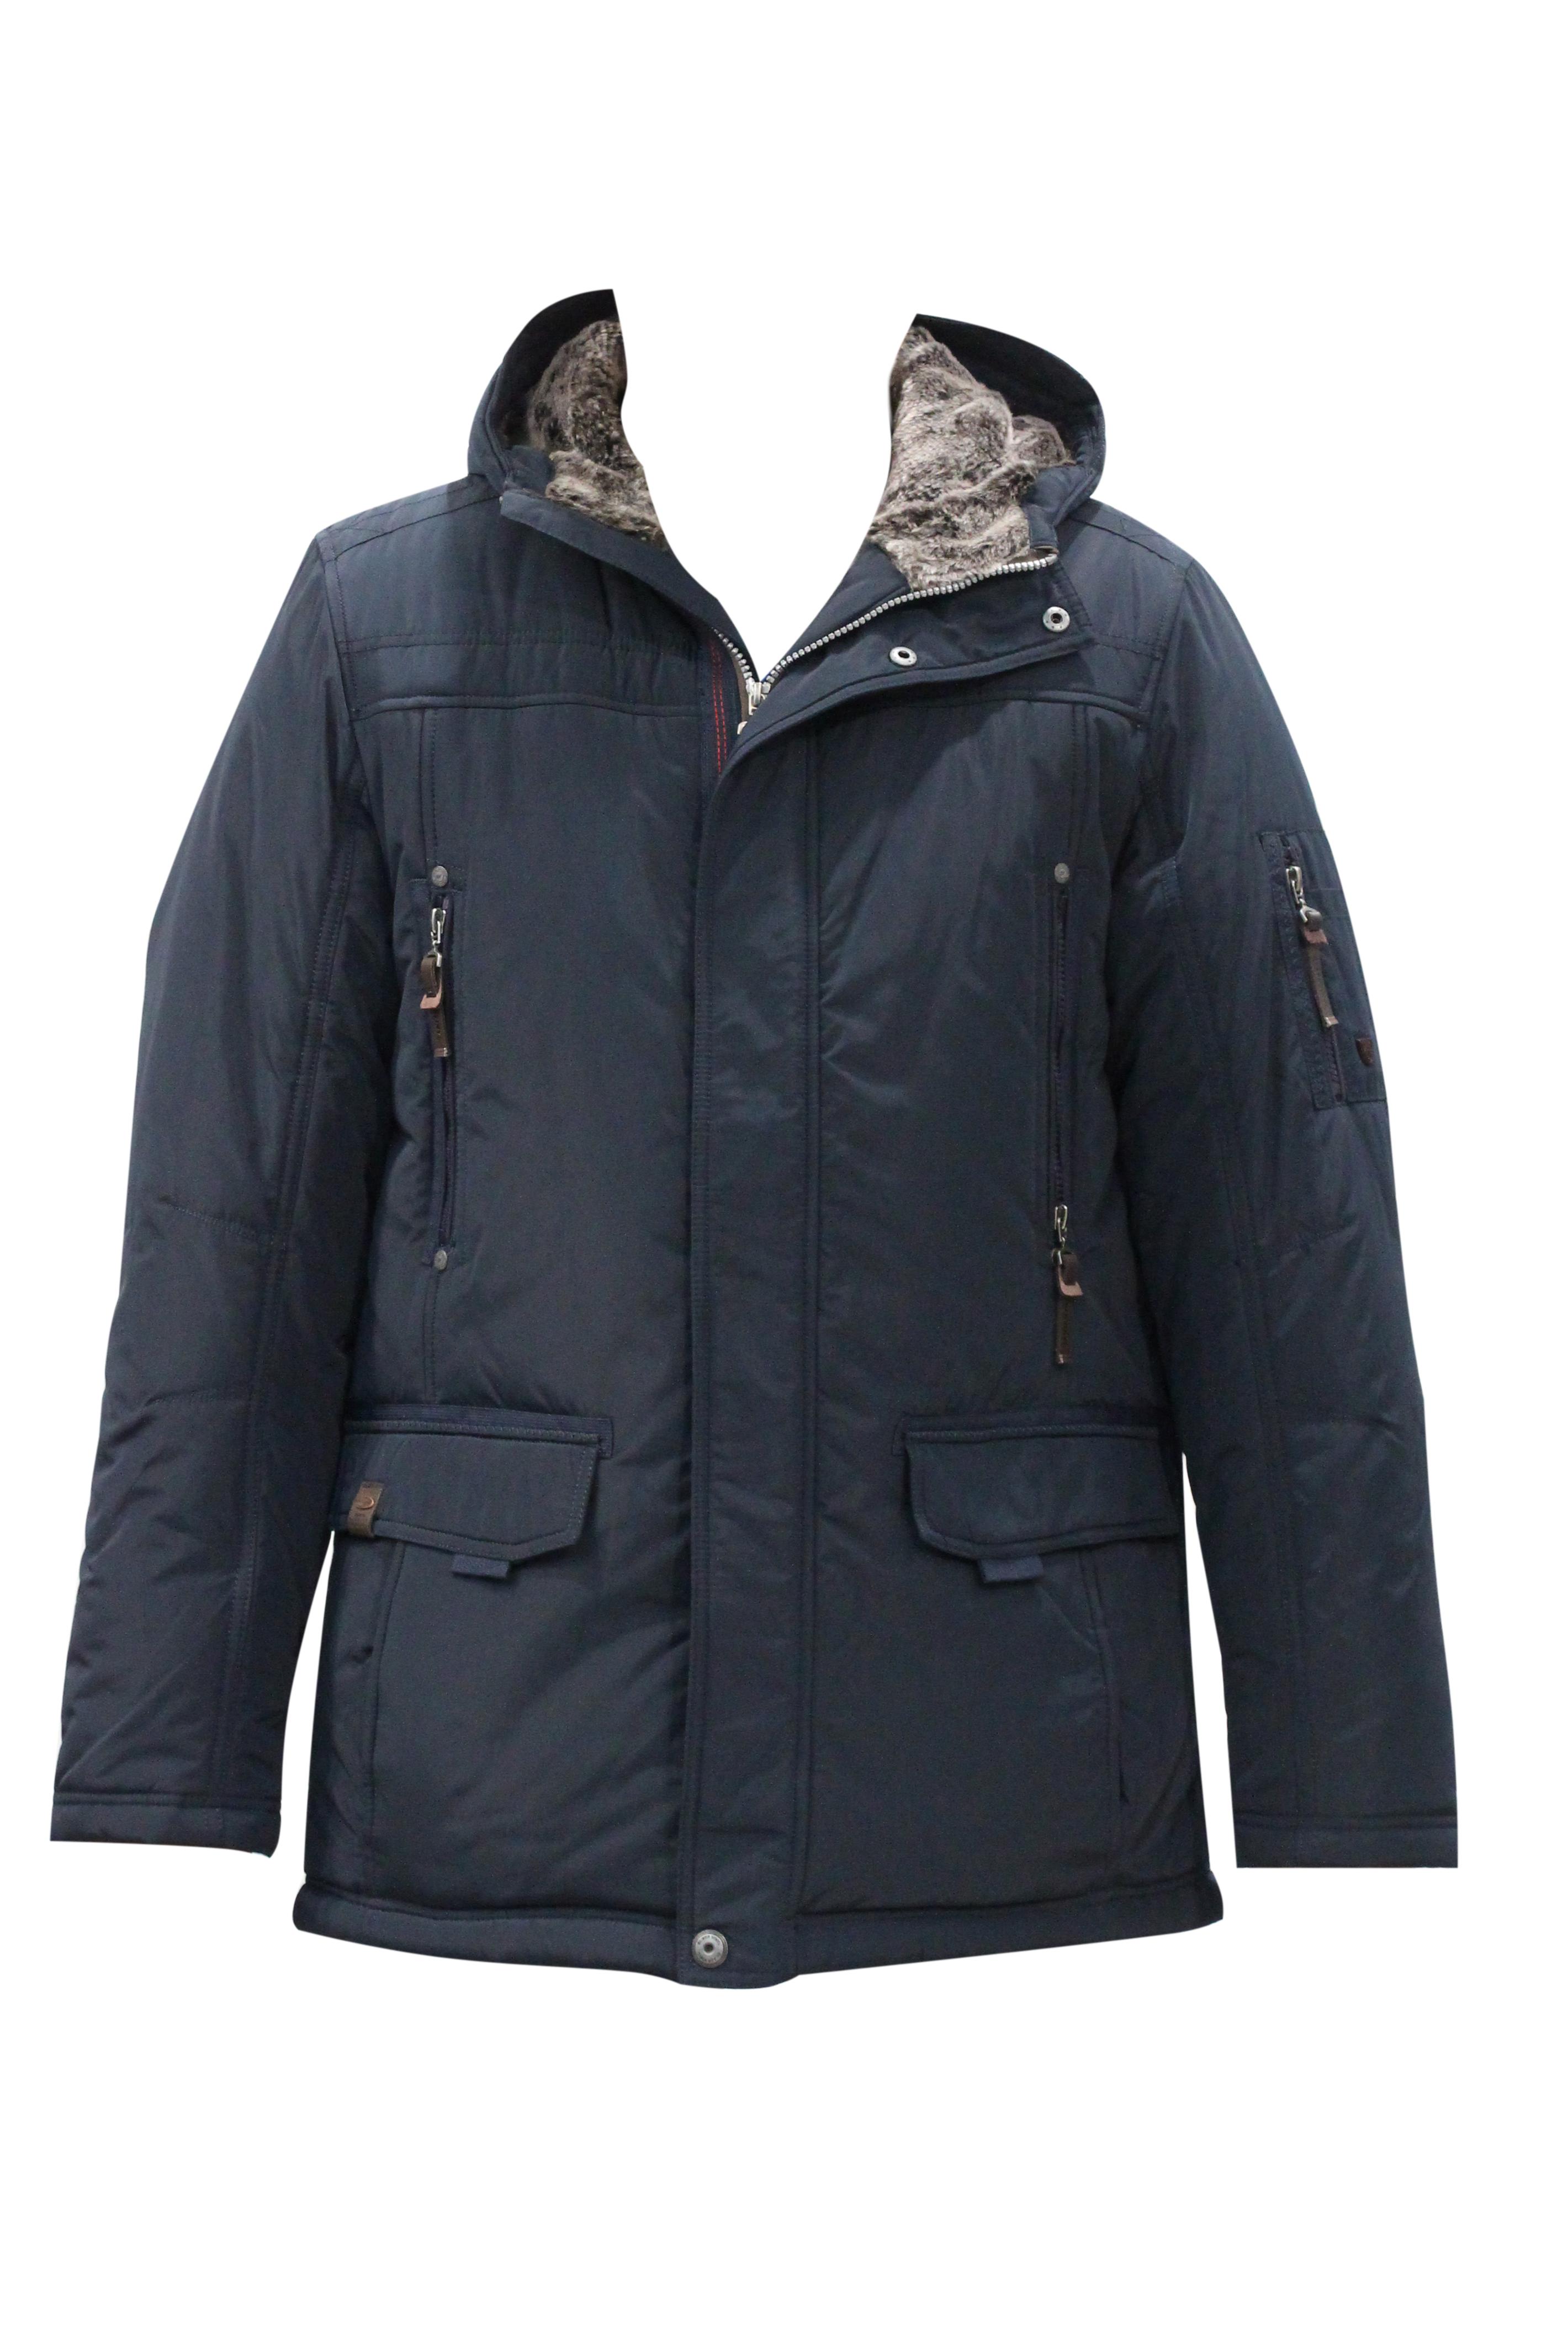 Зимняя куртка Санкт-Петербург BriksTon большие размеры